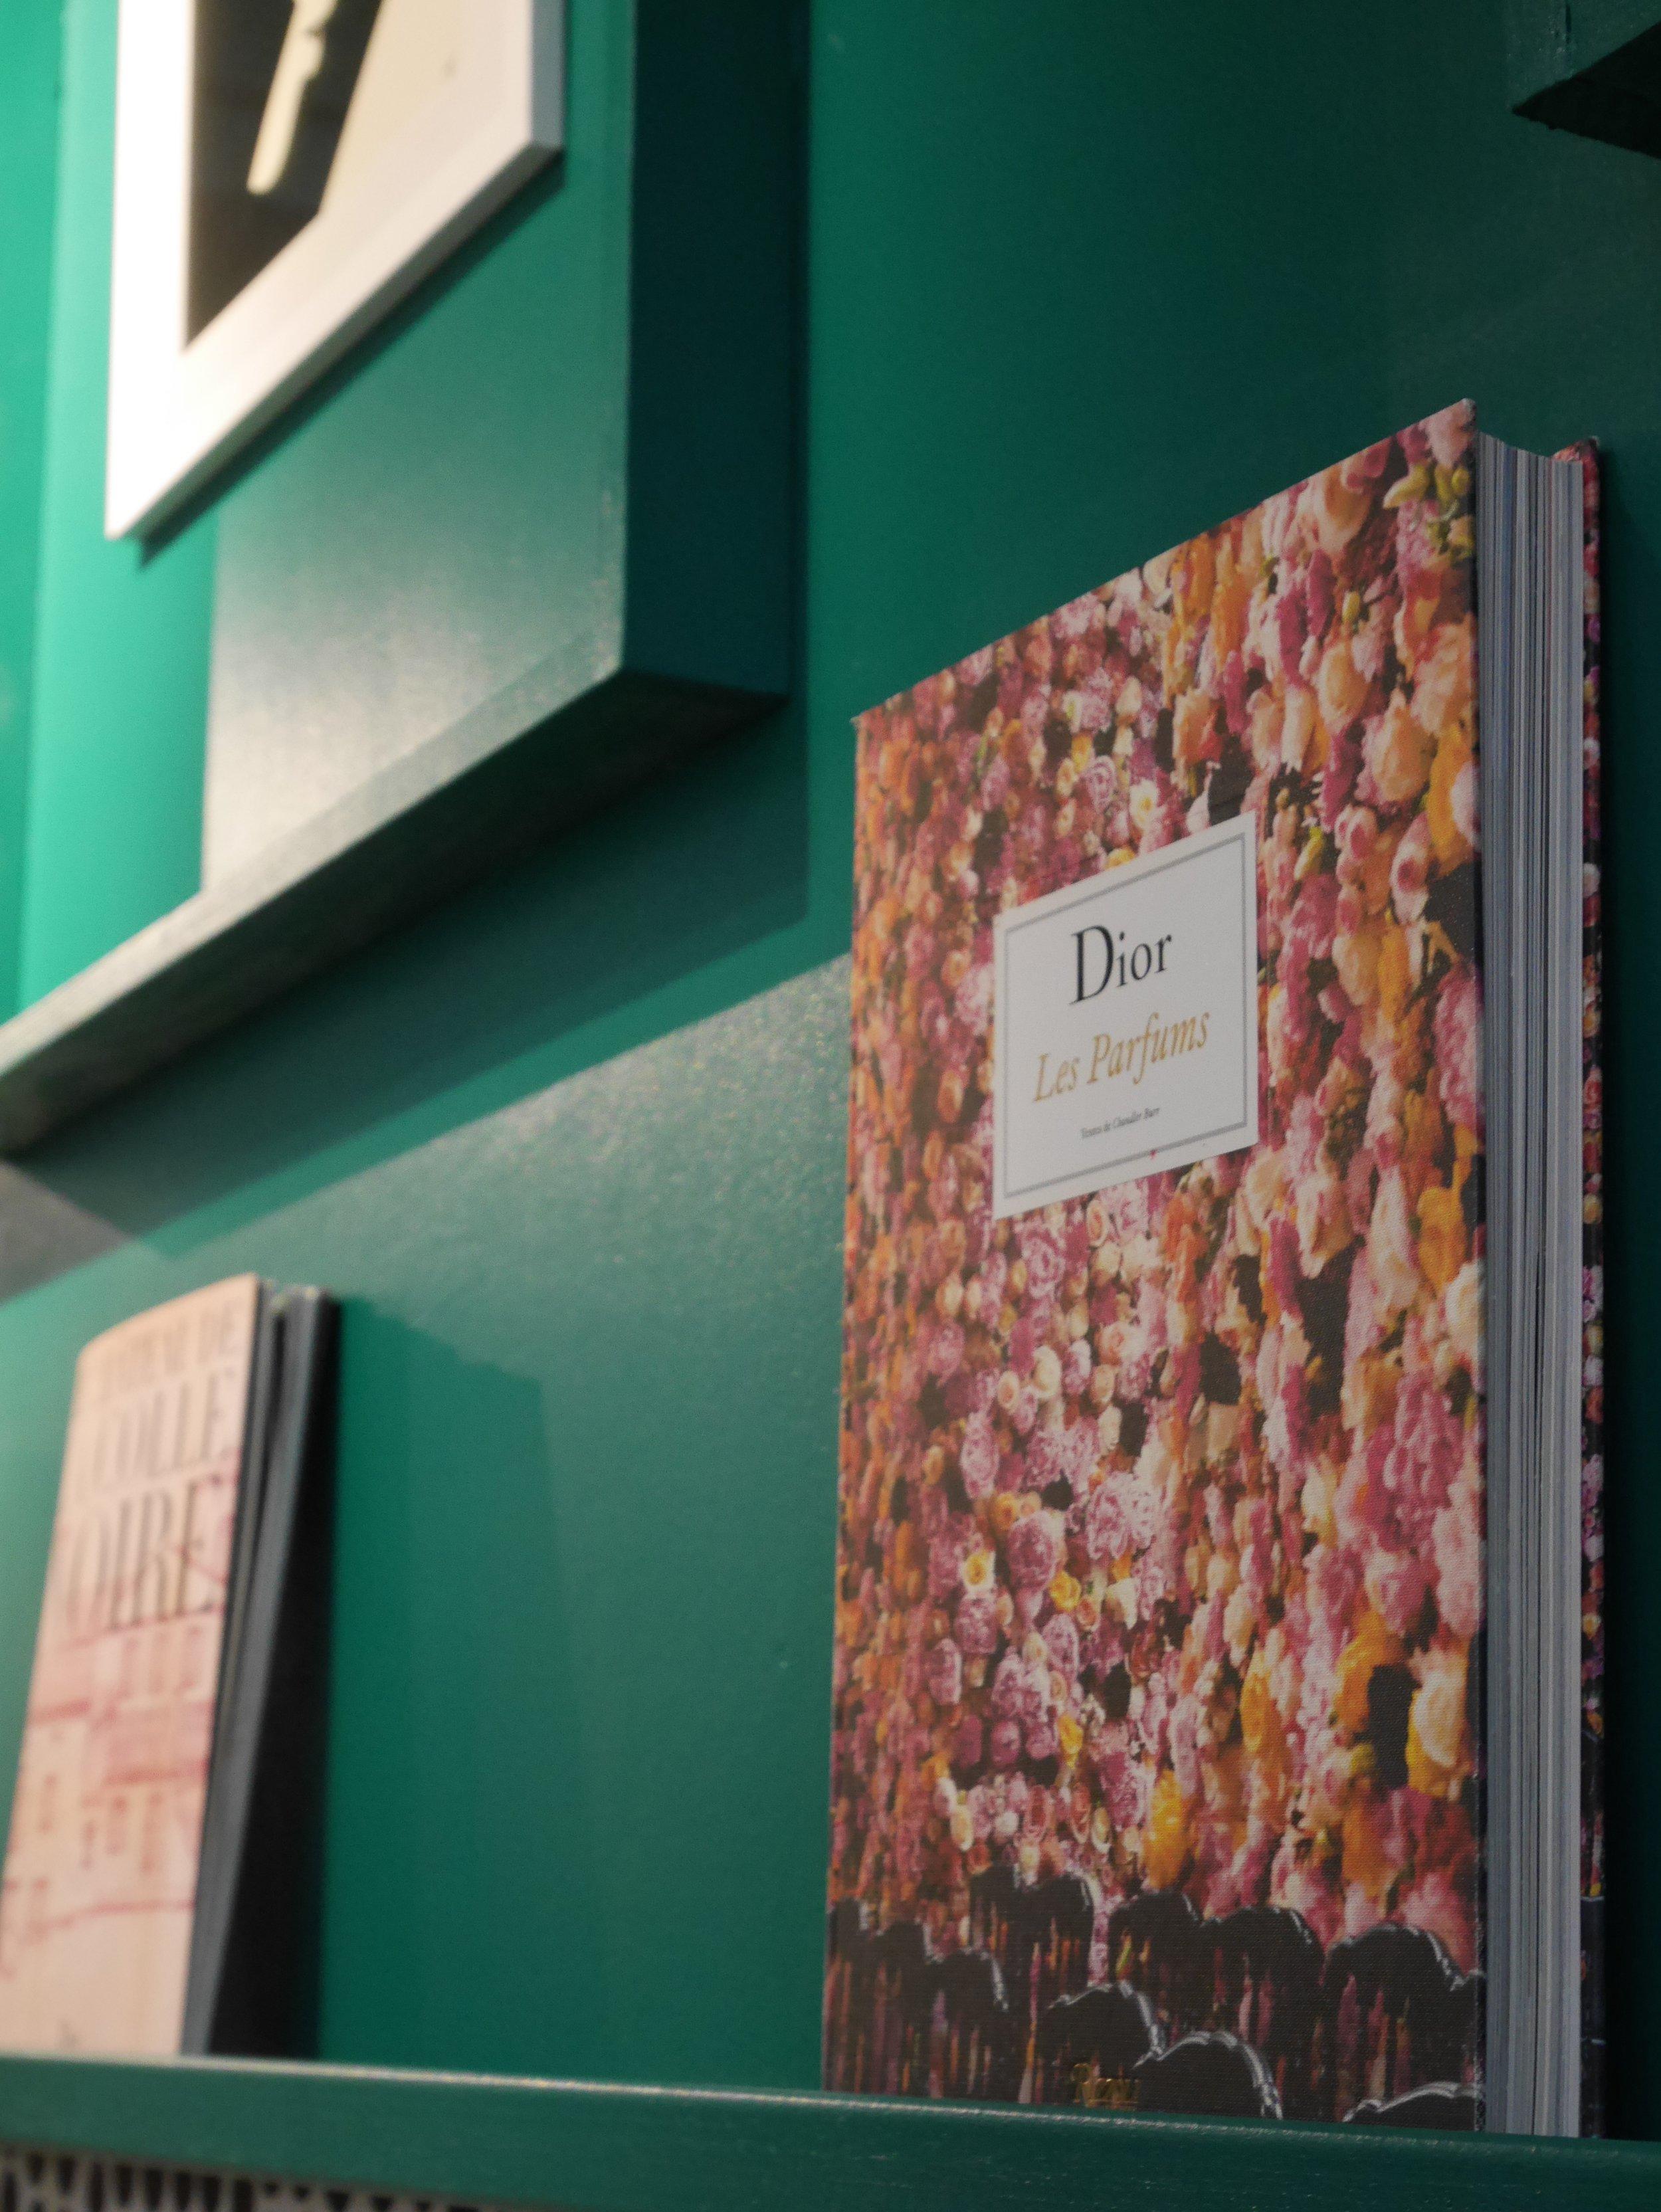 Atelier-olfactif-tea-time-Dior-BHV-elisa-les-bons-tuyaux-6.jpg